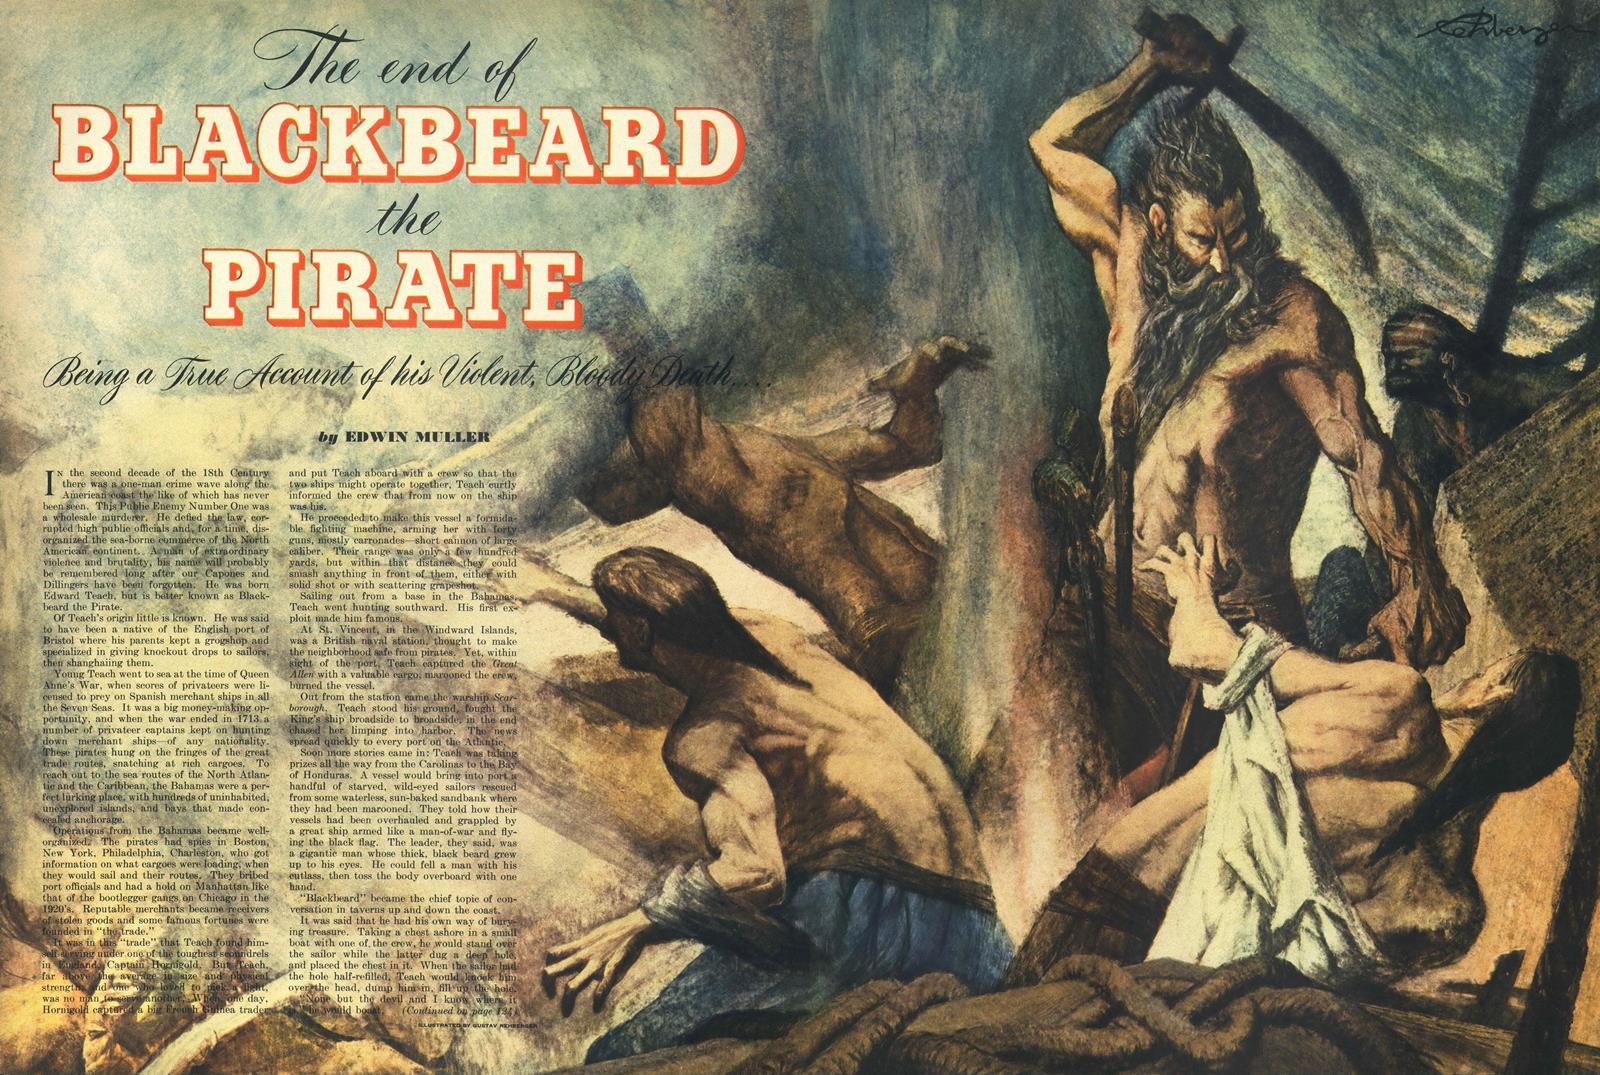 September 1950 - The End of Blackbeard the Pirate